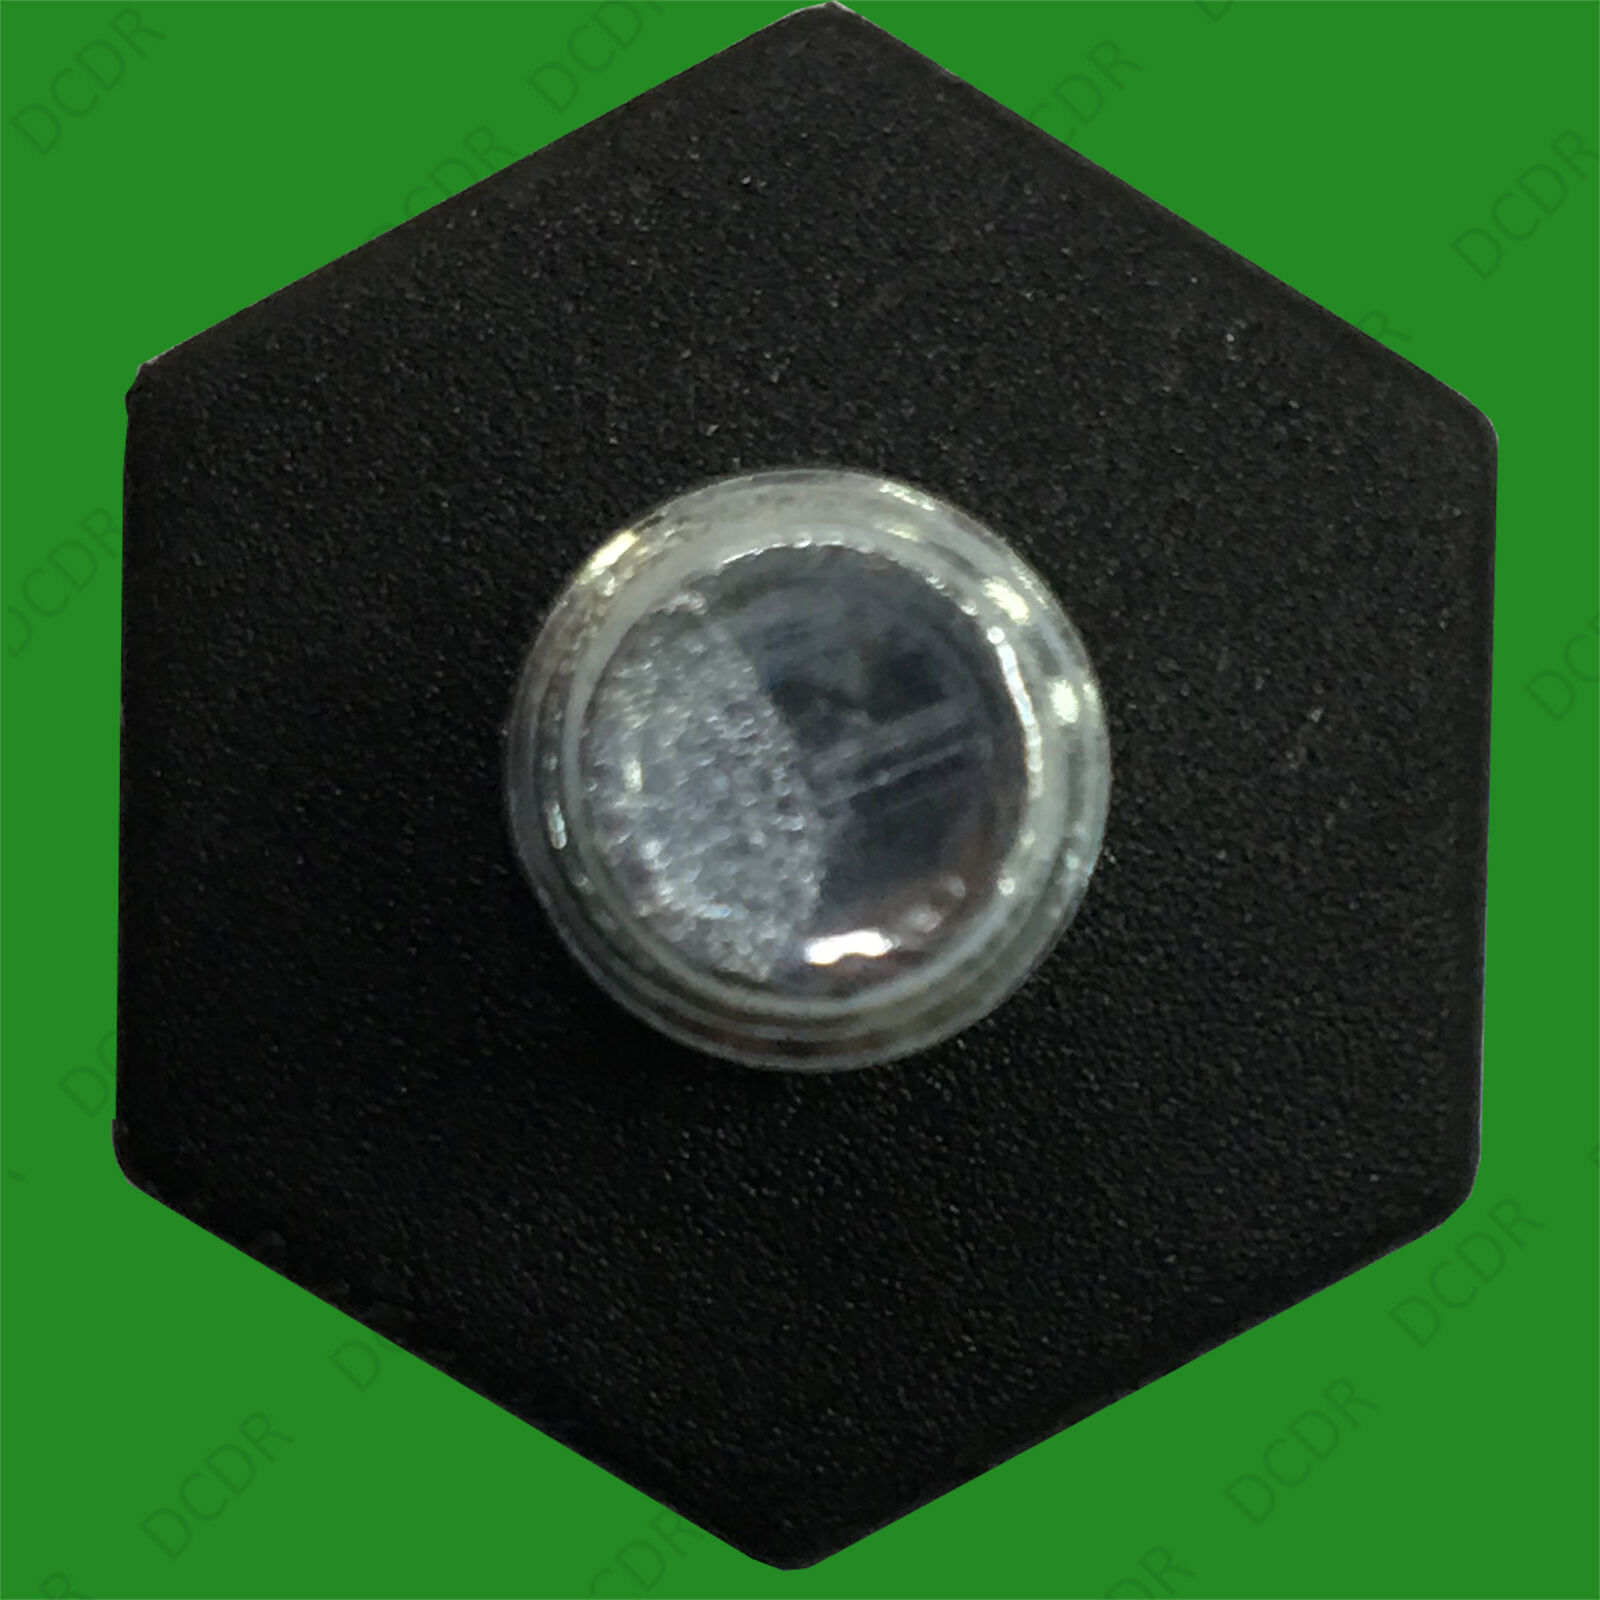 M8x15mm Adjustable Levelling Feet Hex Cross Head Bottom 2x 22mm Base Diameter